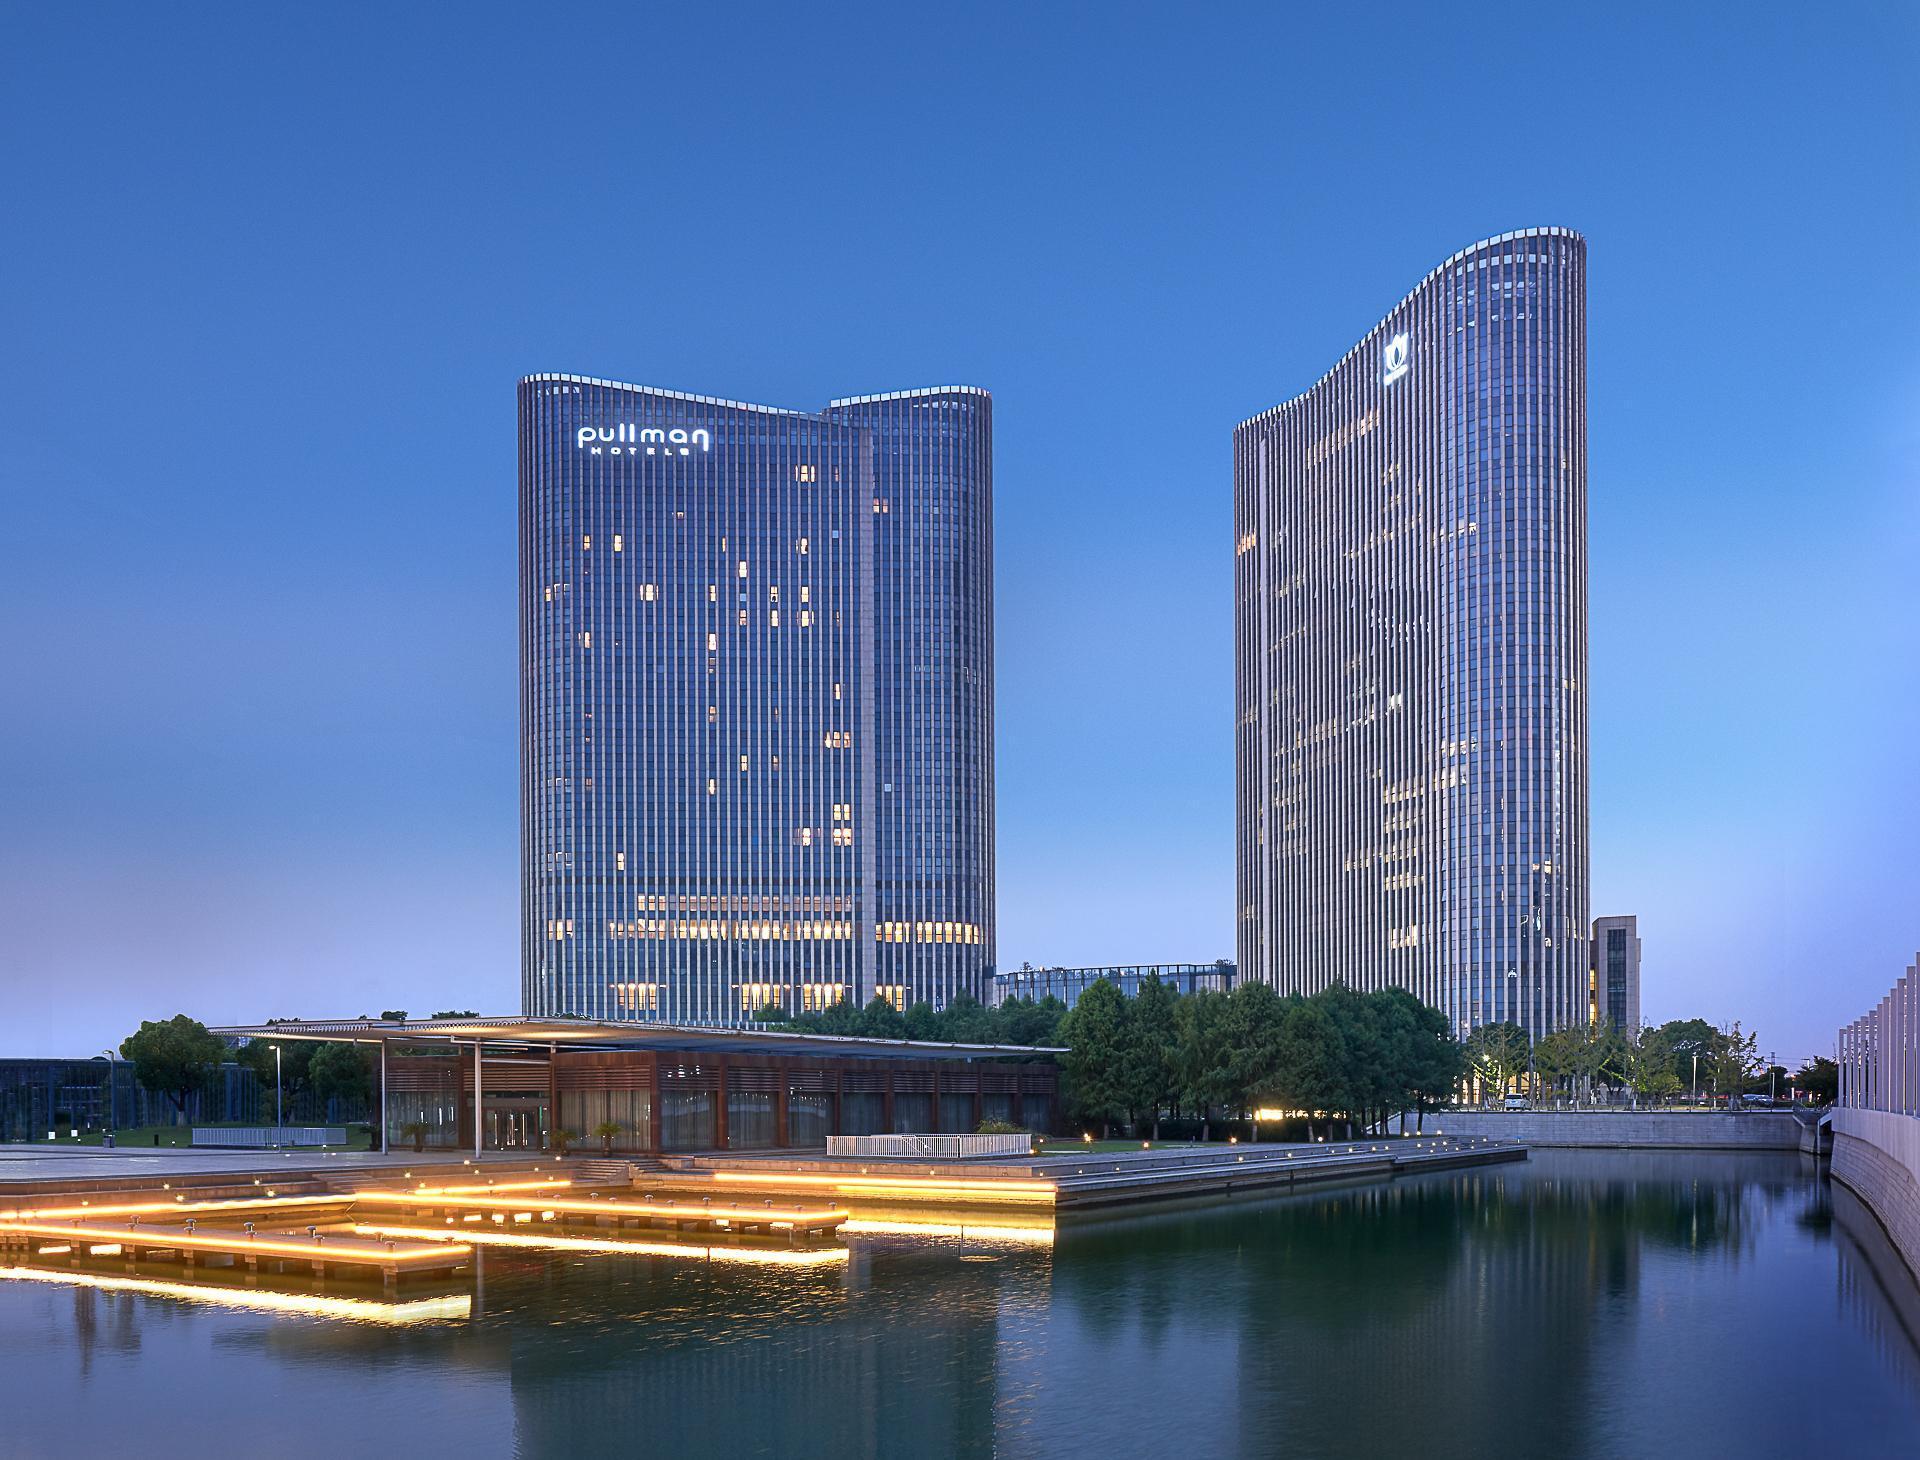 Pullman Wuxi New Lake Hotel